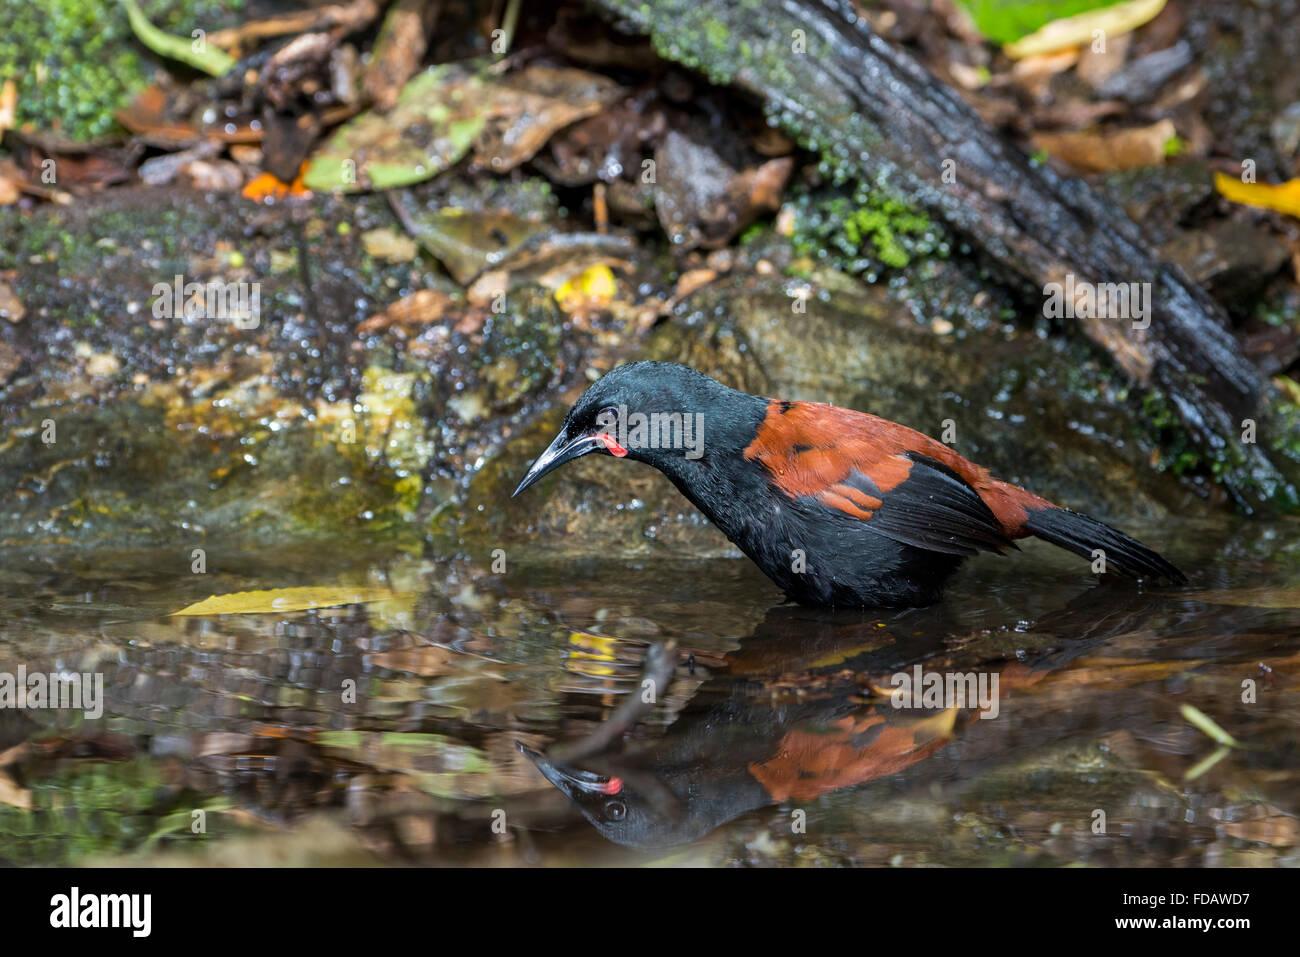 New Zealand, Marlborough Sounds, Motuara Island aka Motu Ara. Predator-free island bird reserve.  Male South Island saddleback. Stock Photo